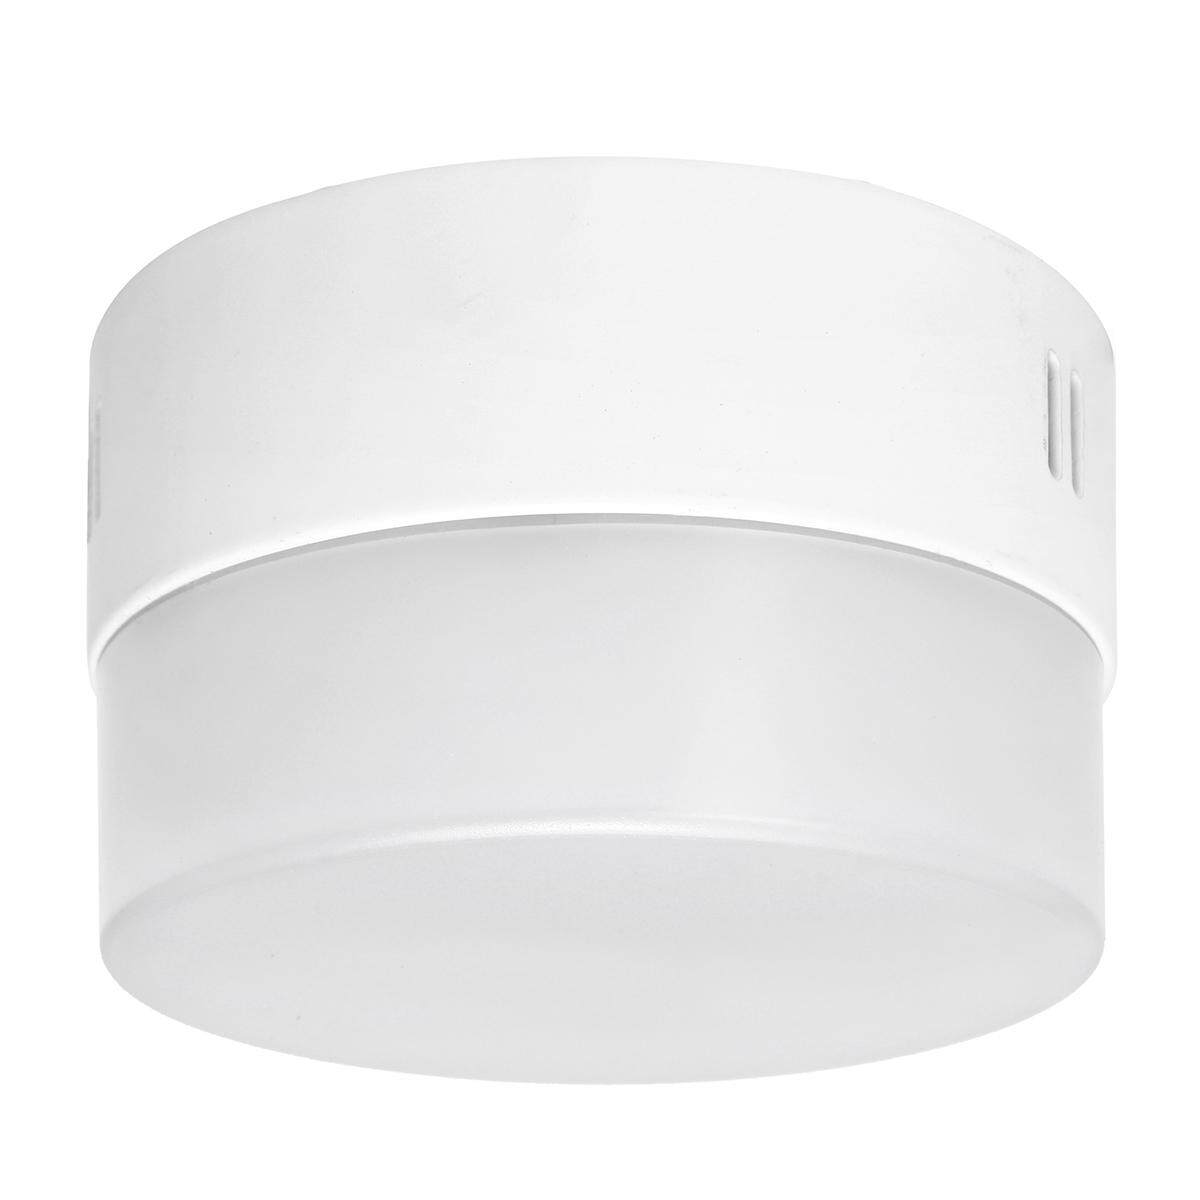 Led Downlight Panel Natural White 12 W Round Model Tanam Daftar Nnp73556 12w 3000k Warm Watt Kotak Squareidr150000 Rp 150000 Optional